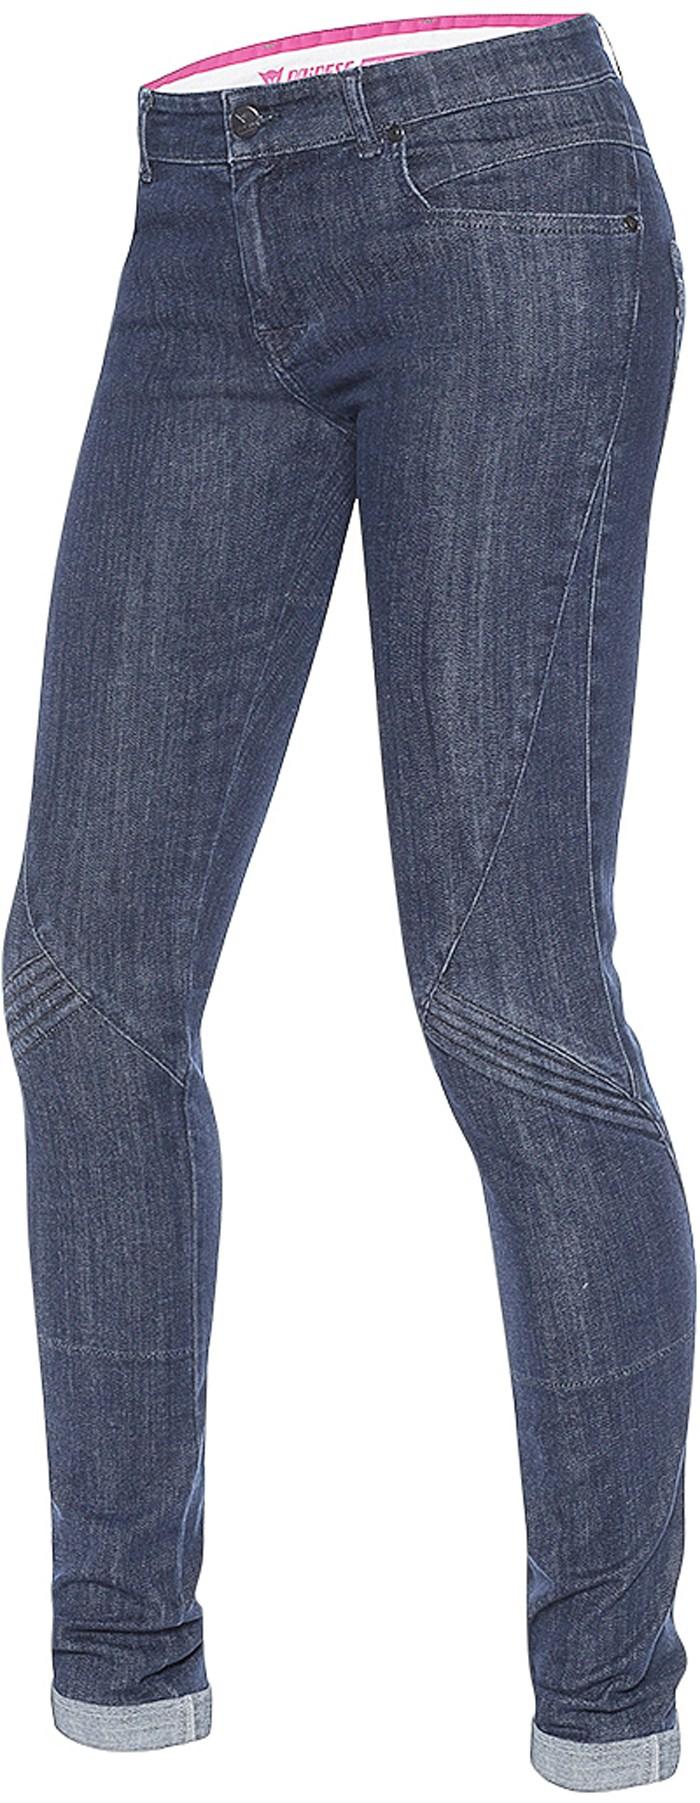 Jeans moto donna Dainese Jessville skinny Denim Blu